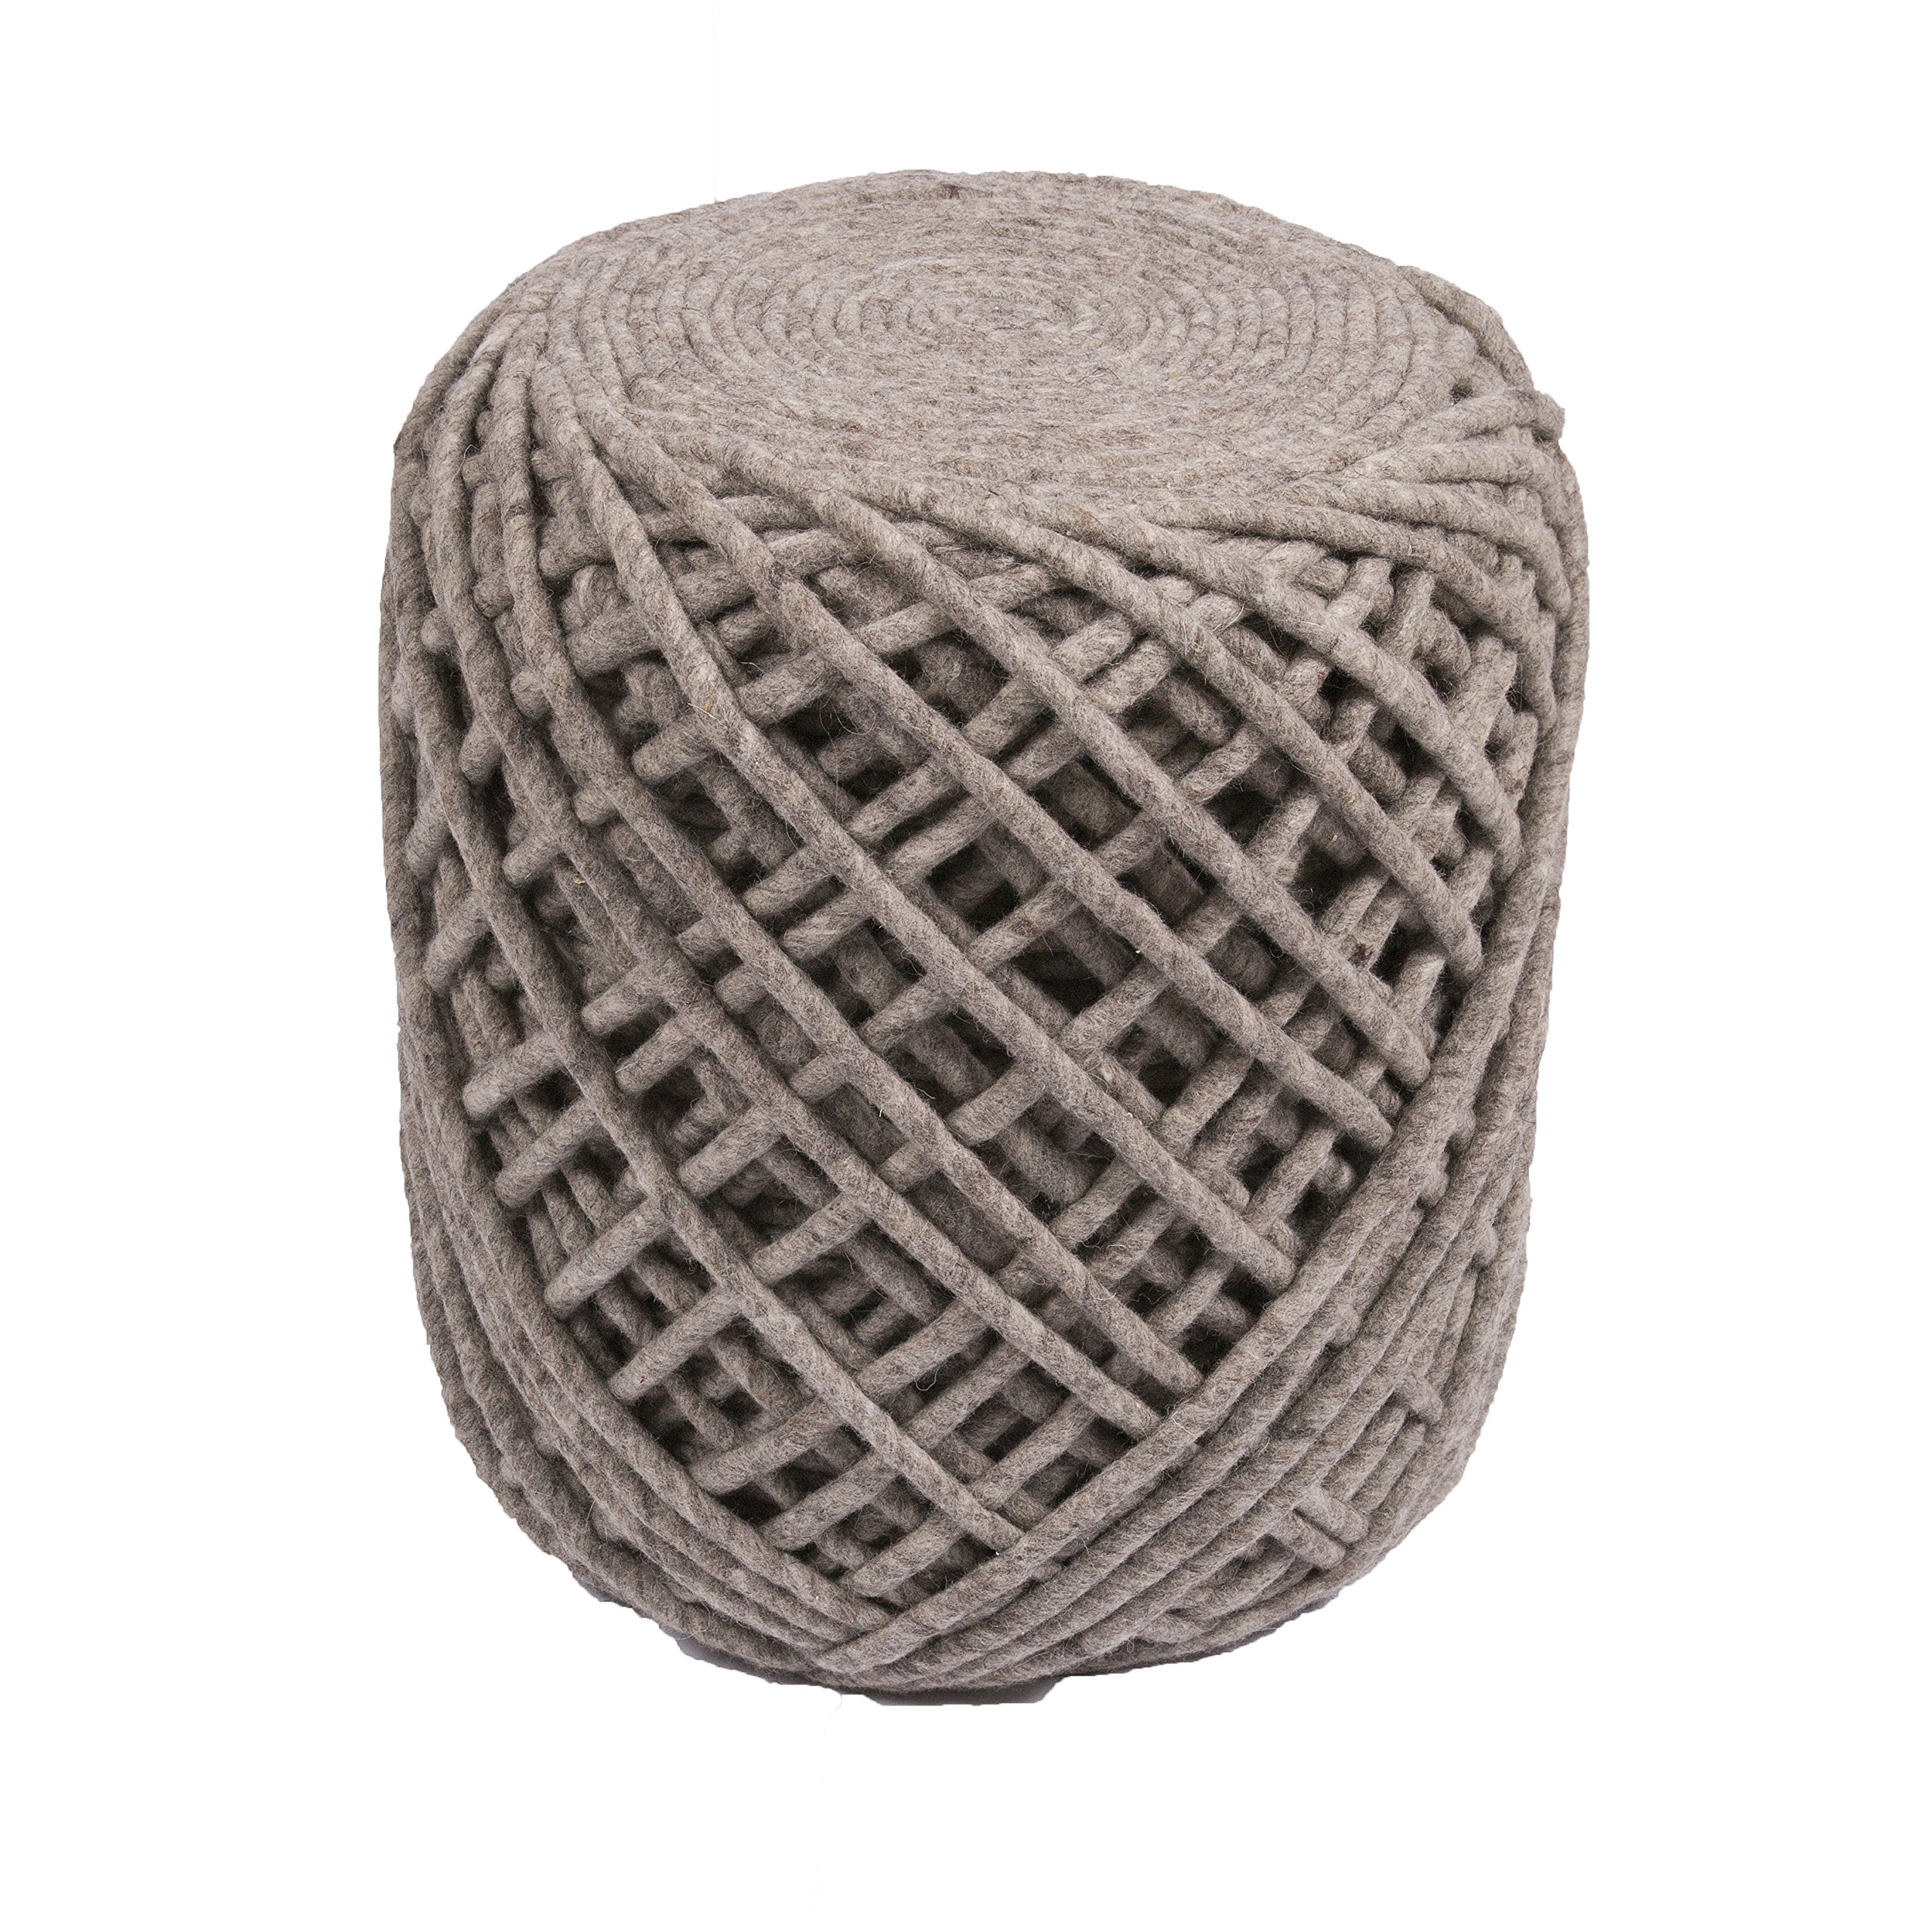 Jaipur Solid Pattern Gray Wool Pouf, 16-Inch x 18-Inch x 18-Inch, Ash Guna